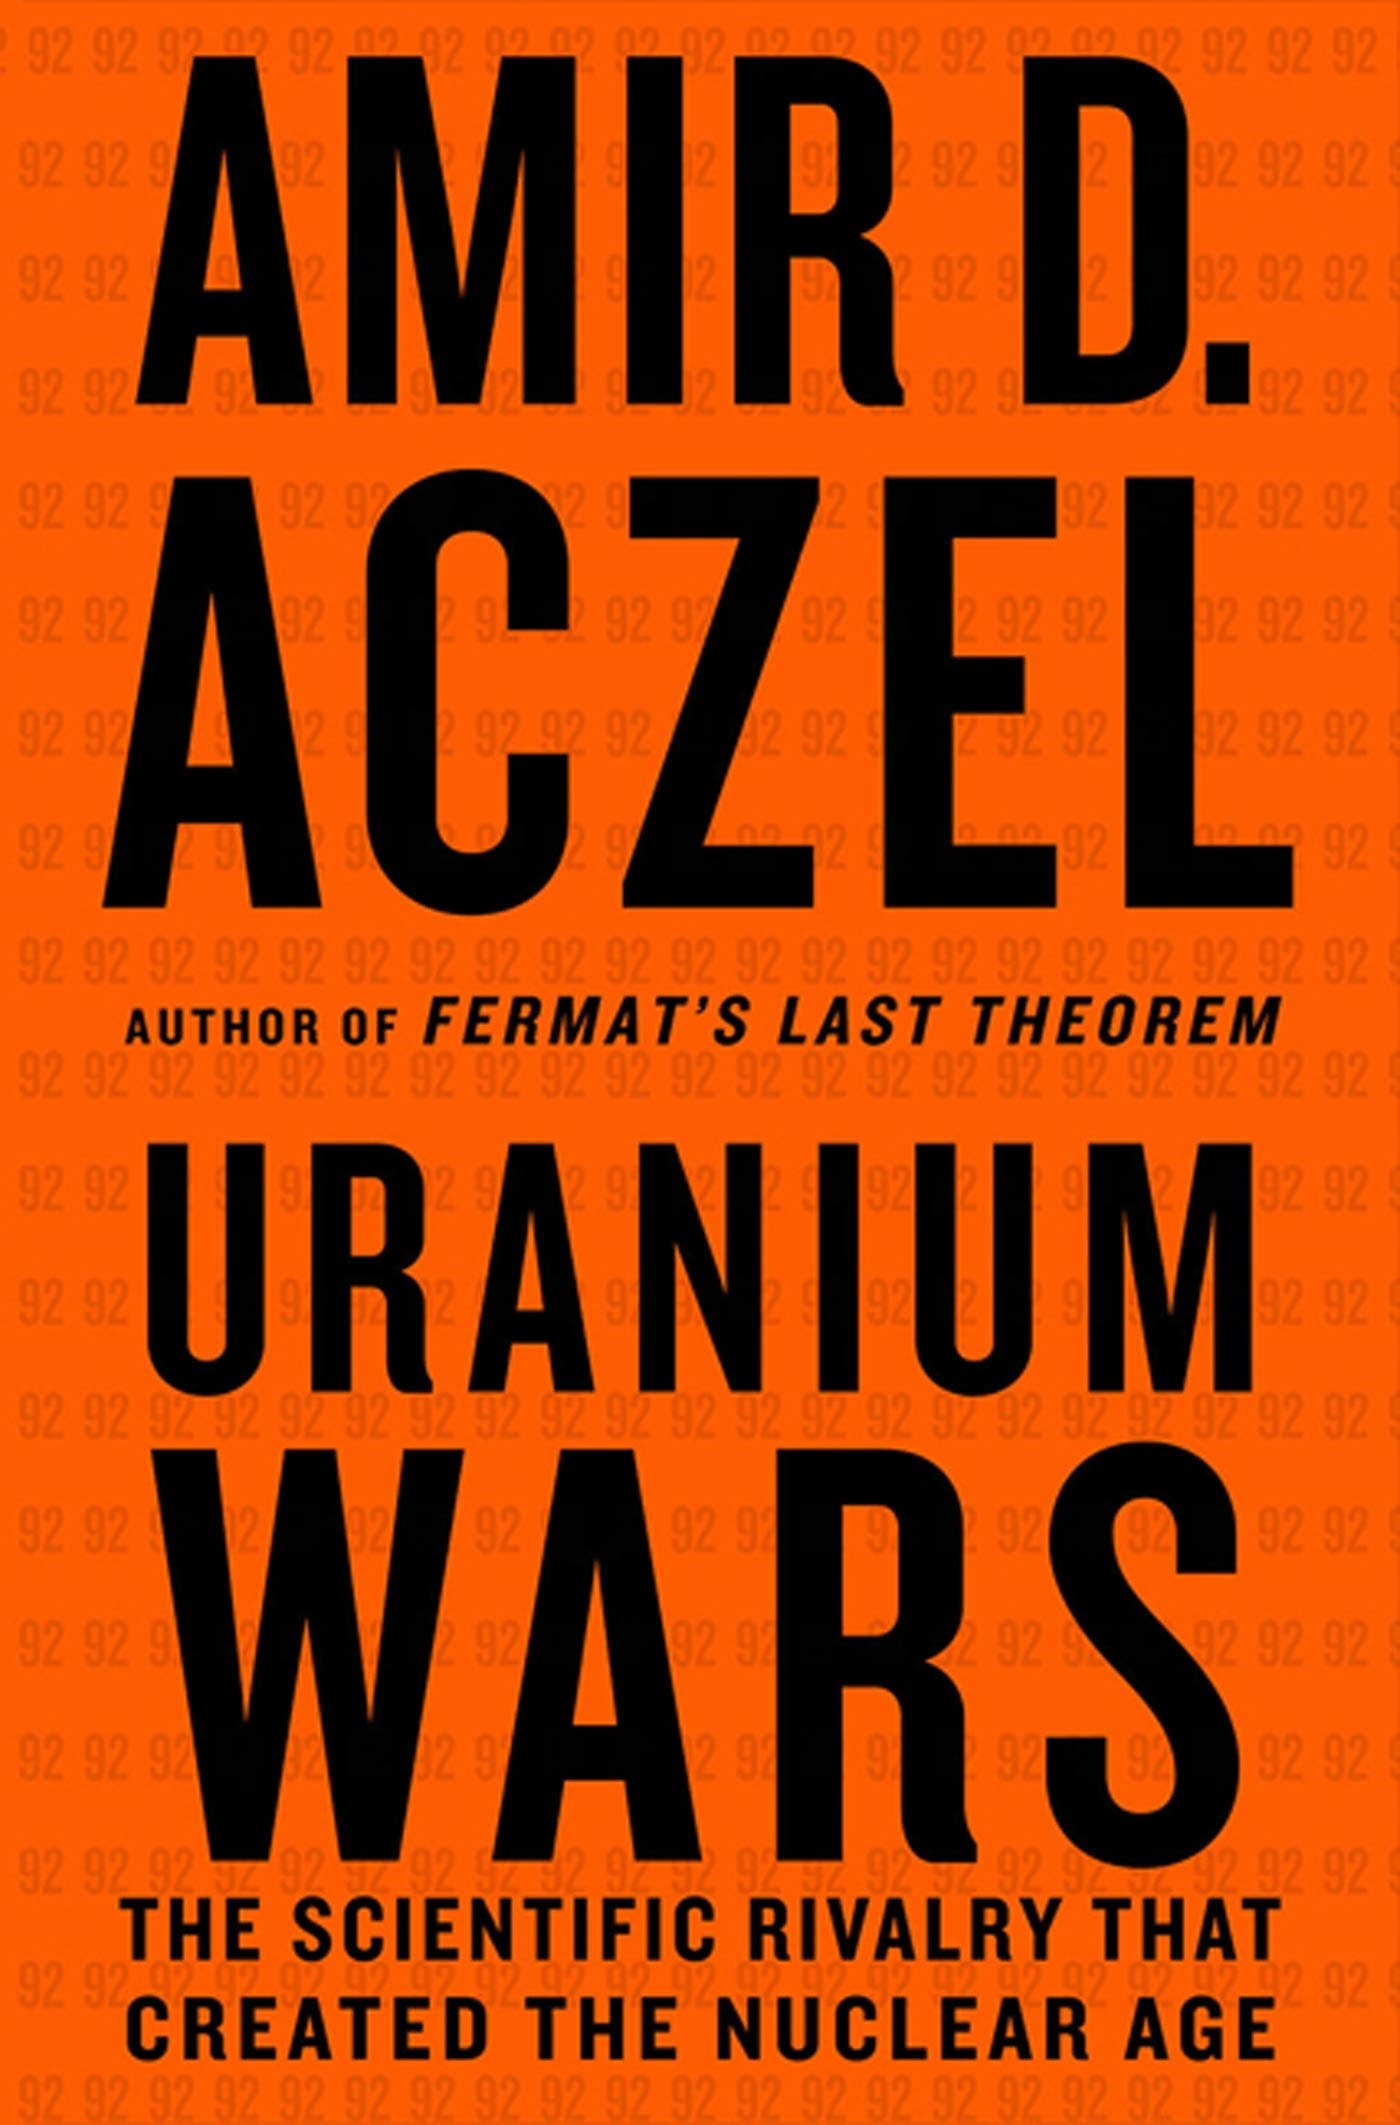 Image of Uranium Wars